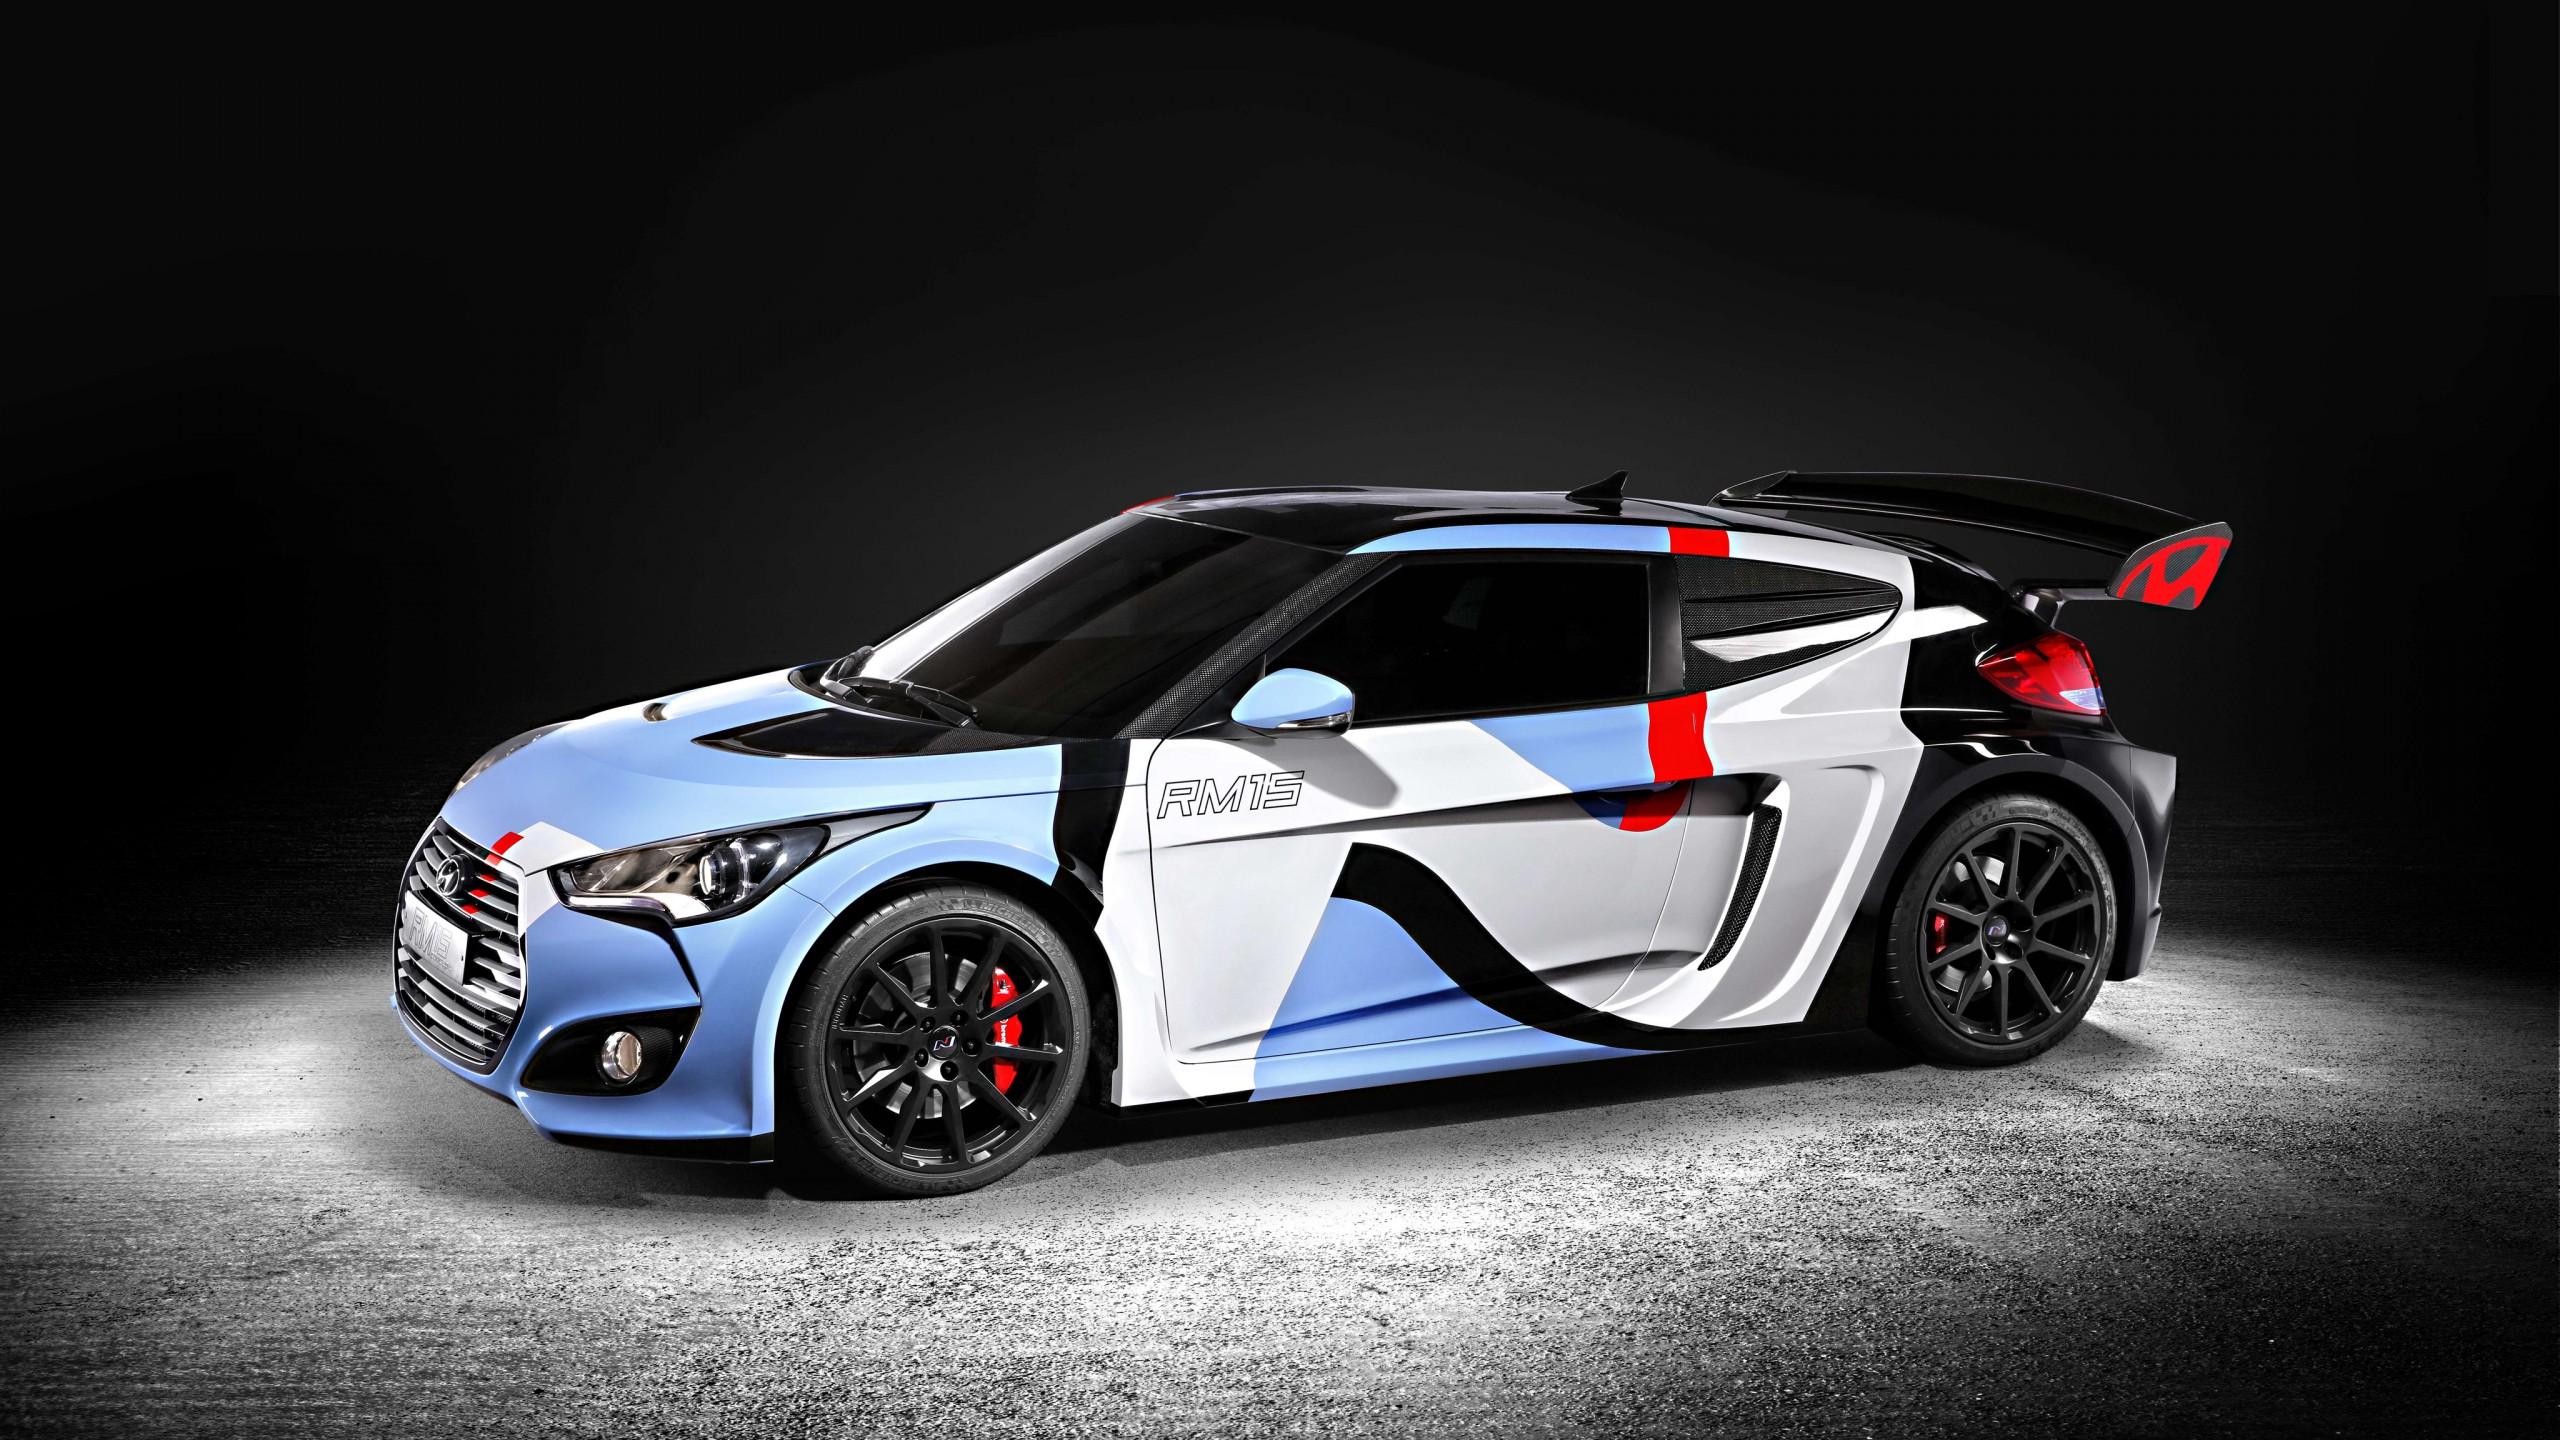 Wallpaper Hyundai Rm15 Rally Edition Concept Seoul